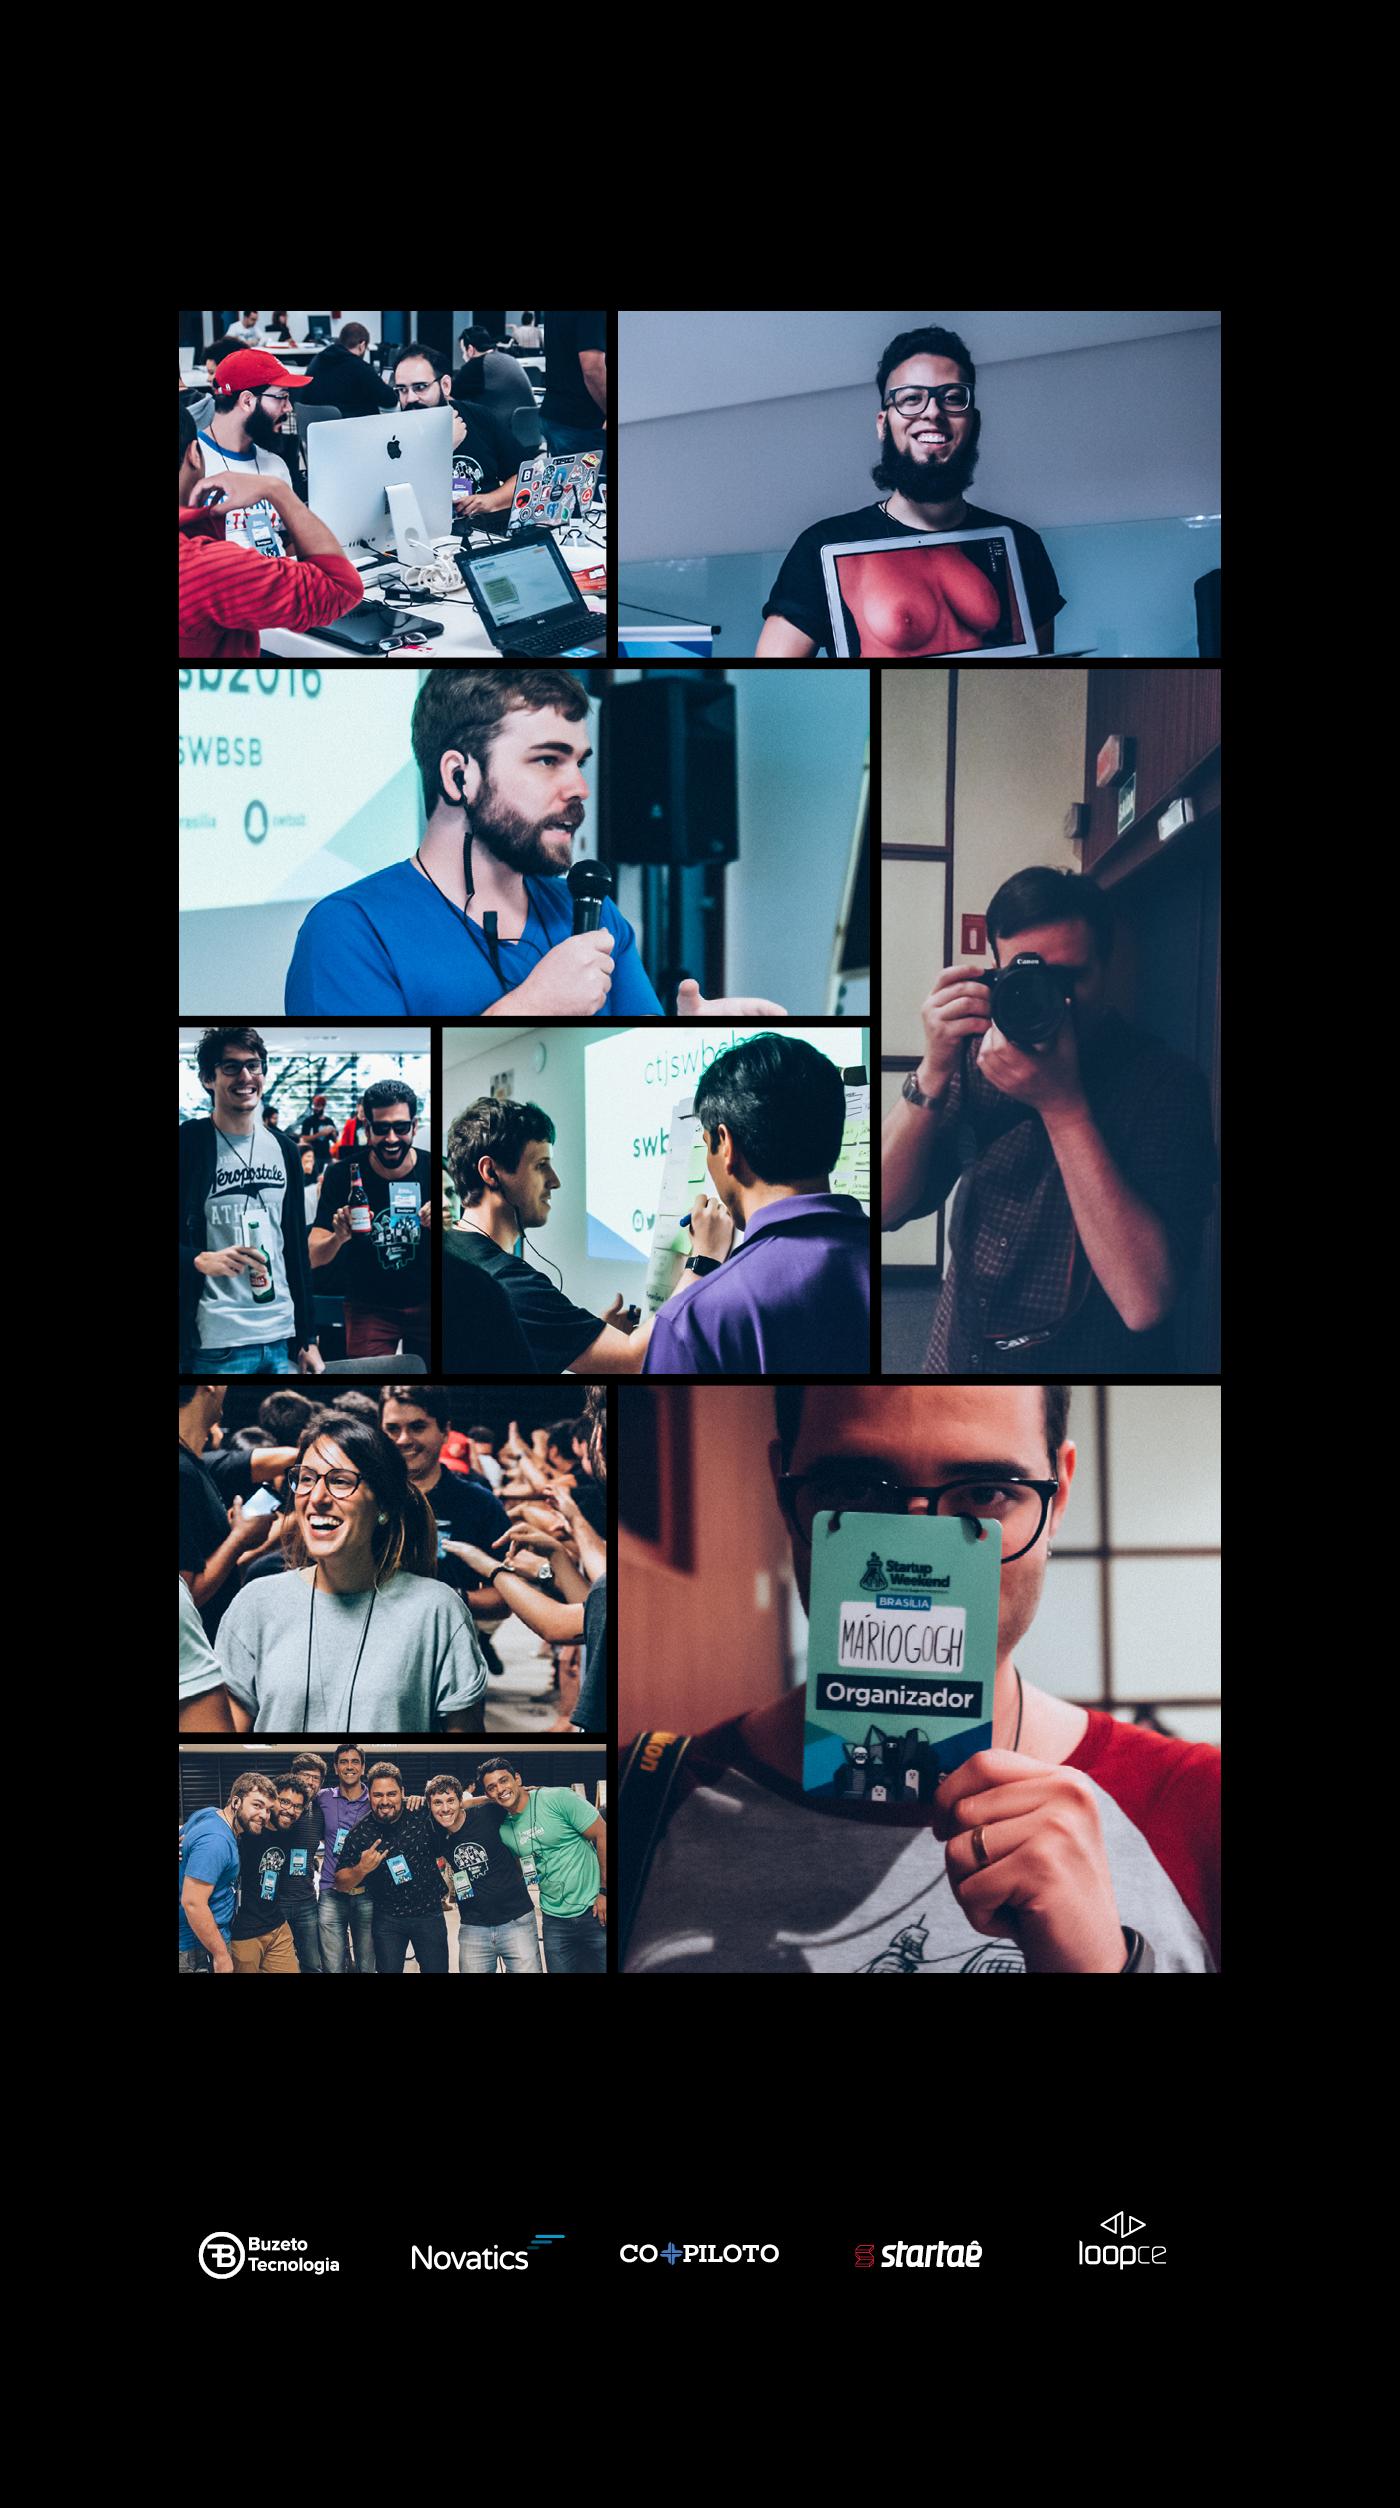 Event identity startups Socialmedia